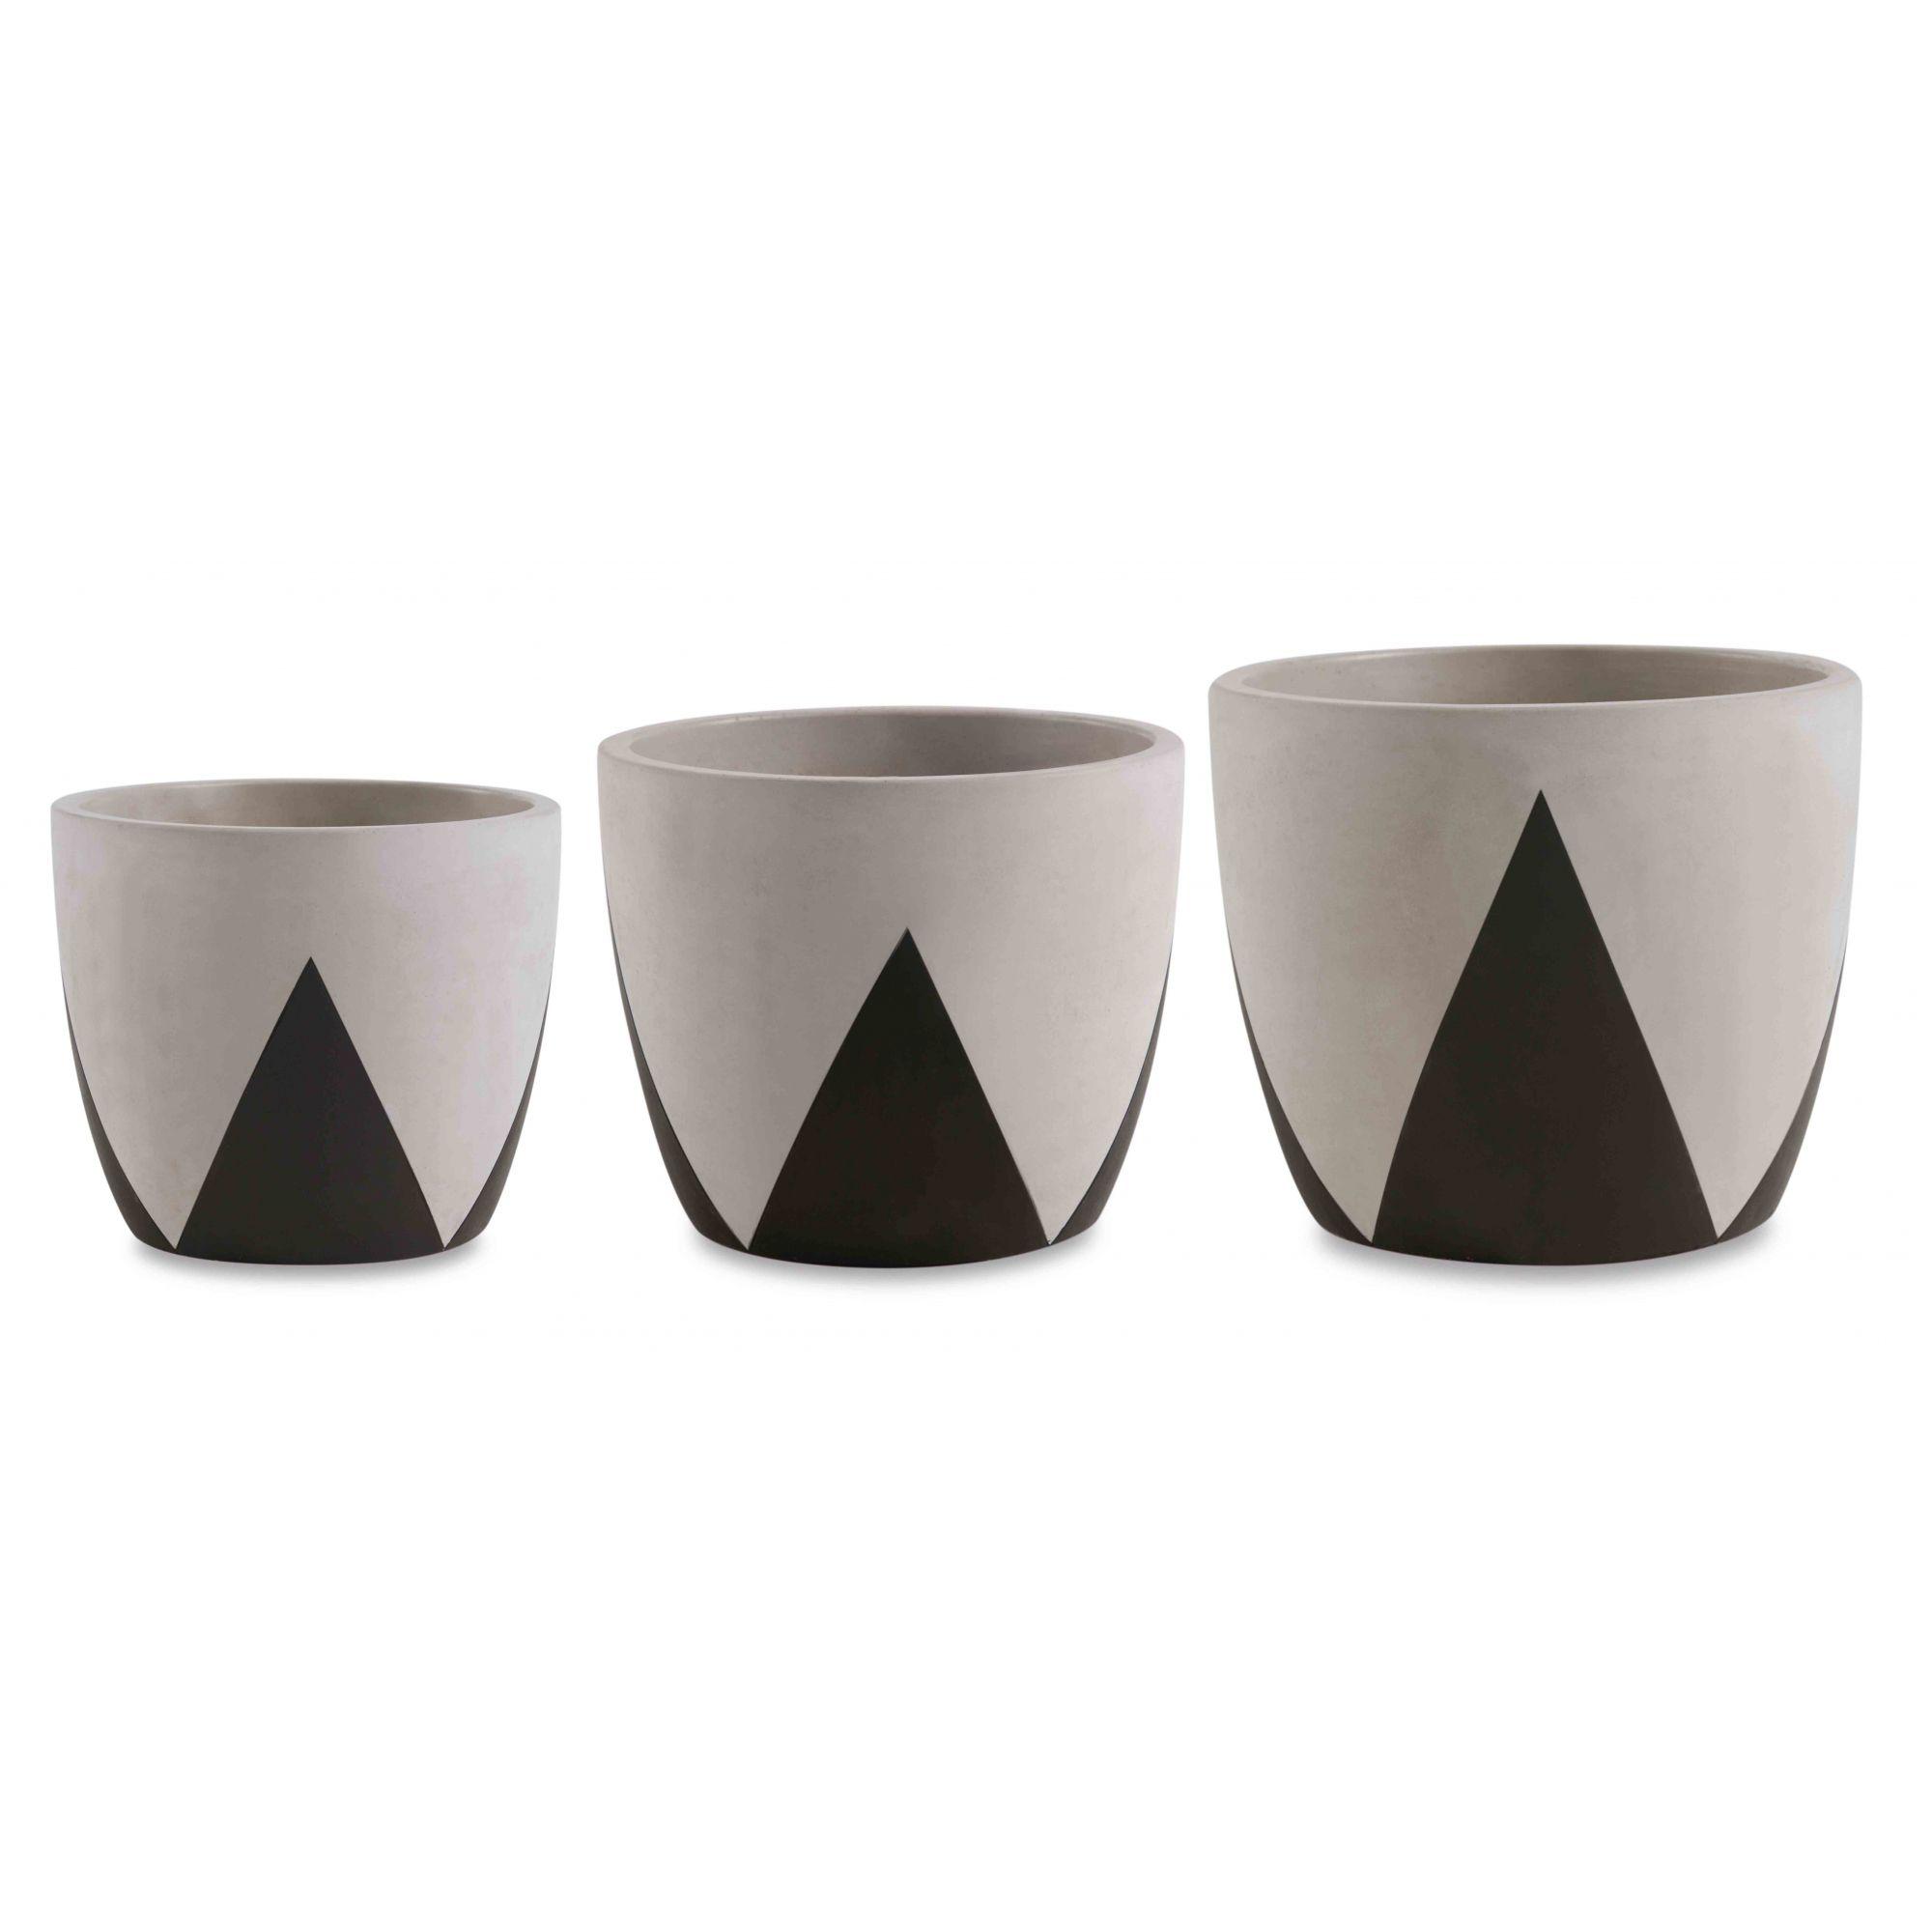 Kit c/3 Vasos em Concreto e Preto